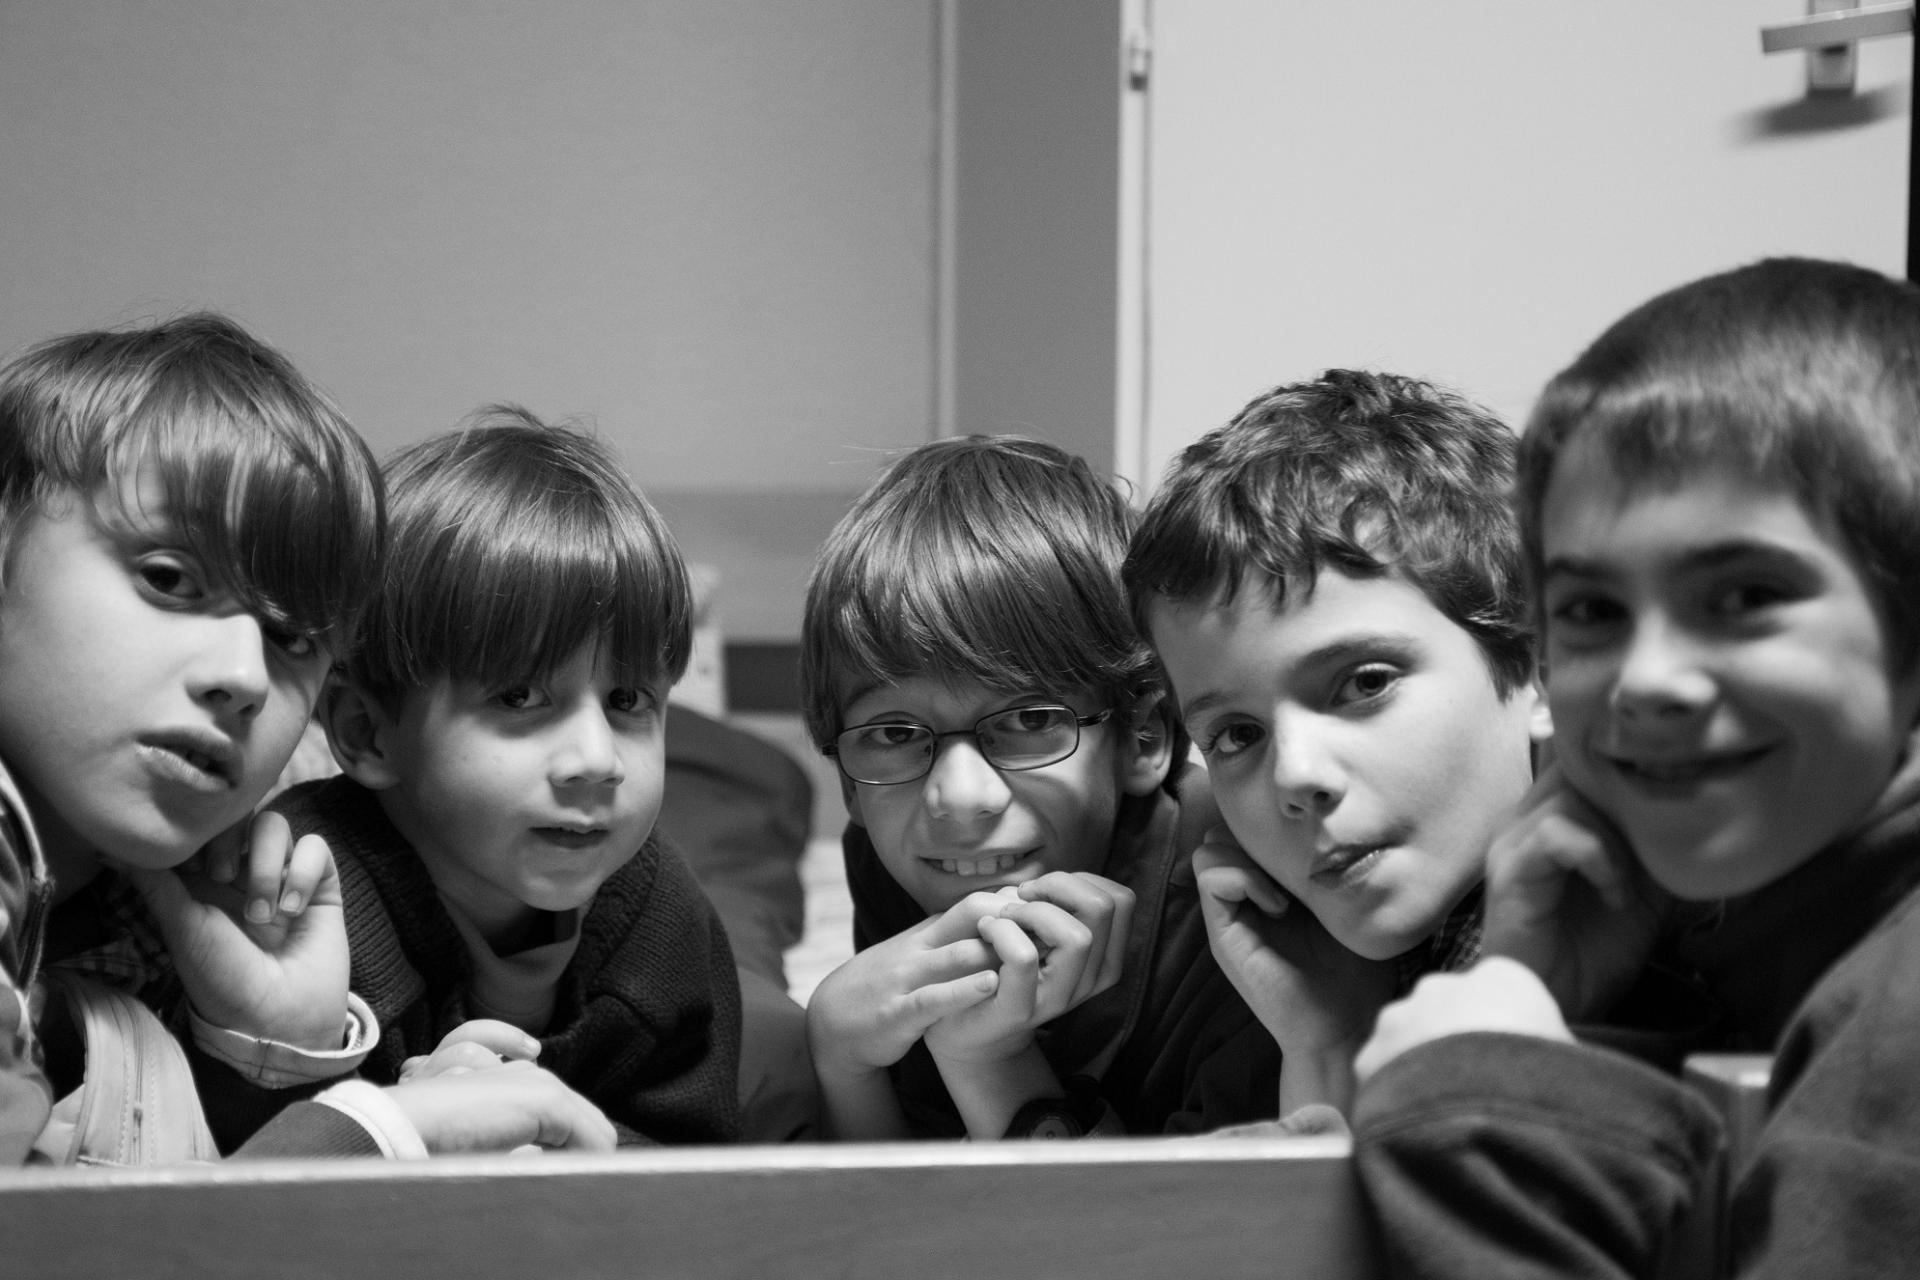 Mathis, Siméon, Raphaël, Armand et Samuel